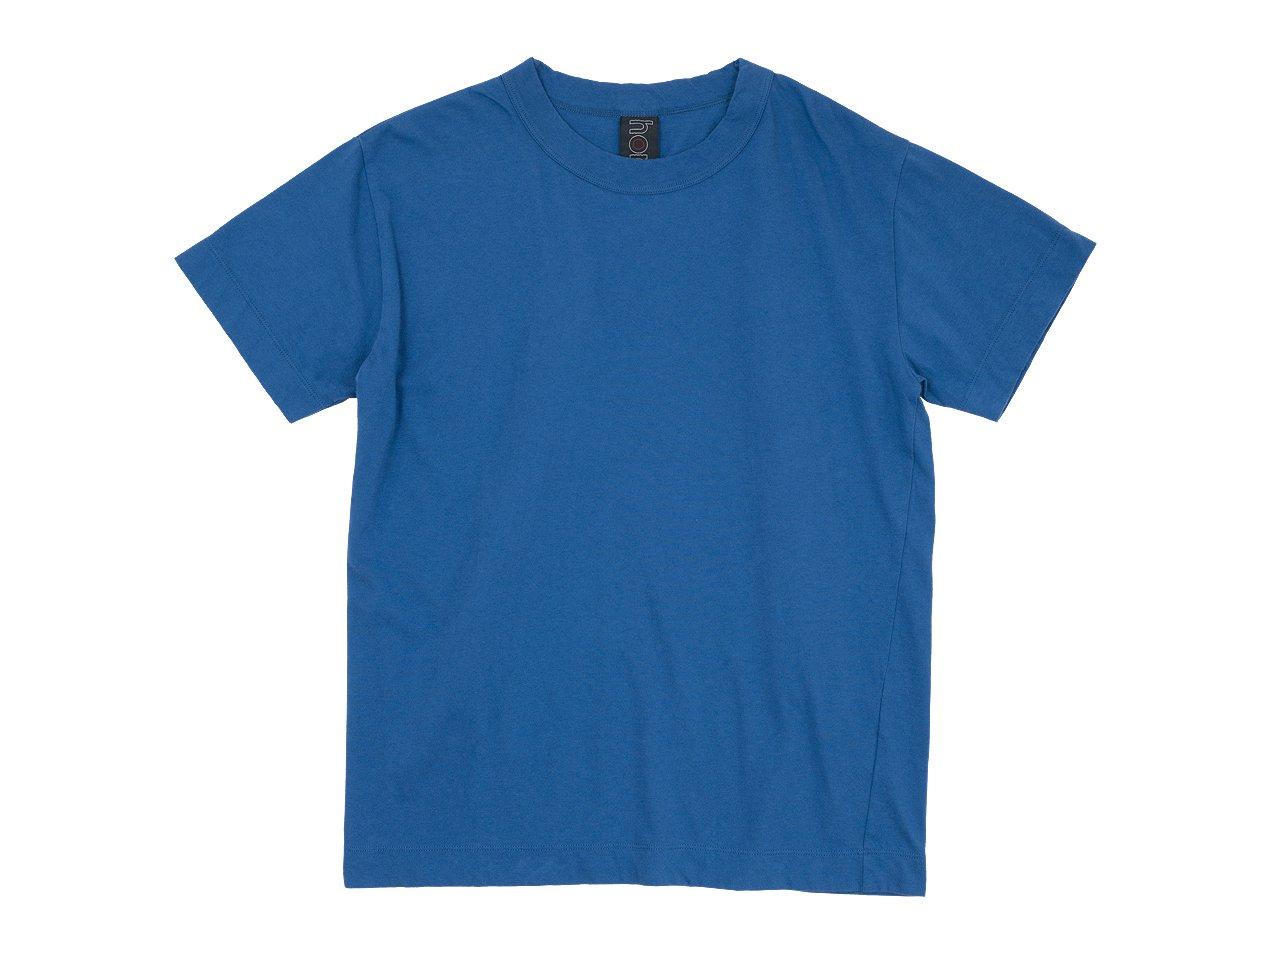 homspun 30/1天竺半袖Tシャツ ブルー 〔メンズ〕